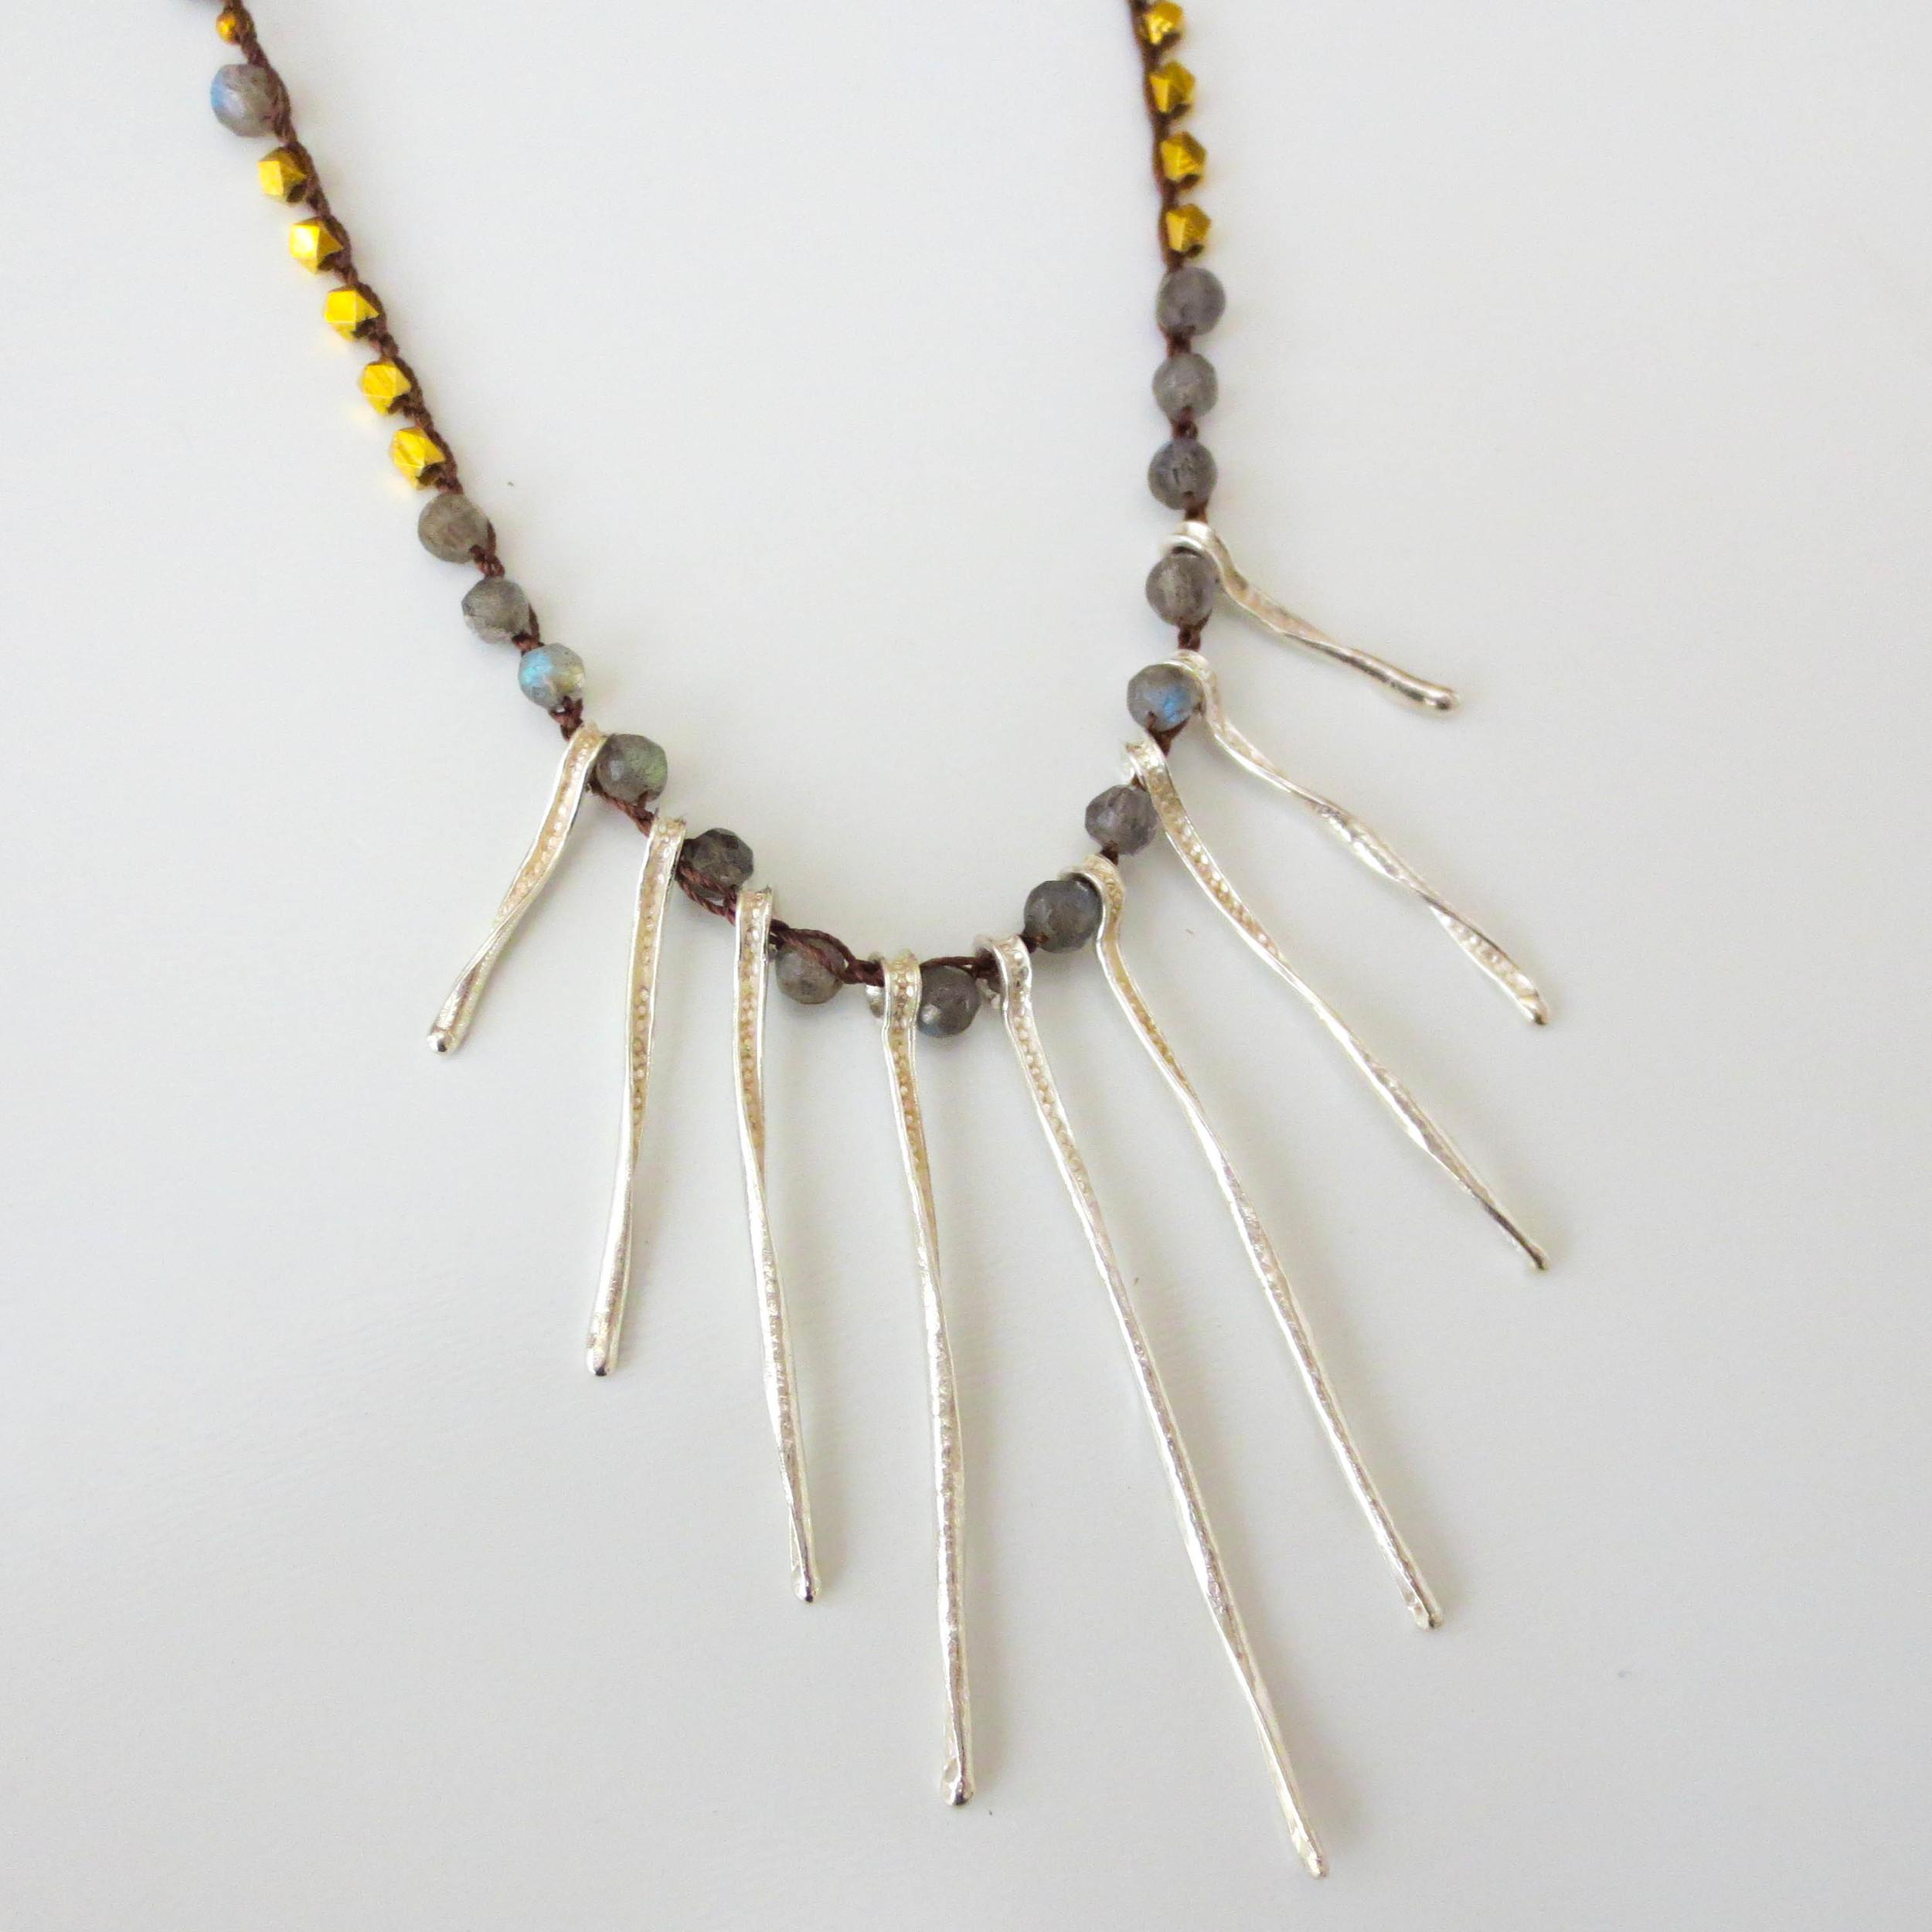 shawn-payne-necklace2.jpg